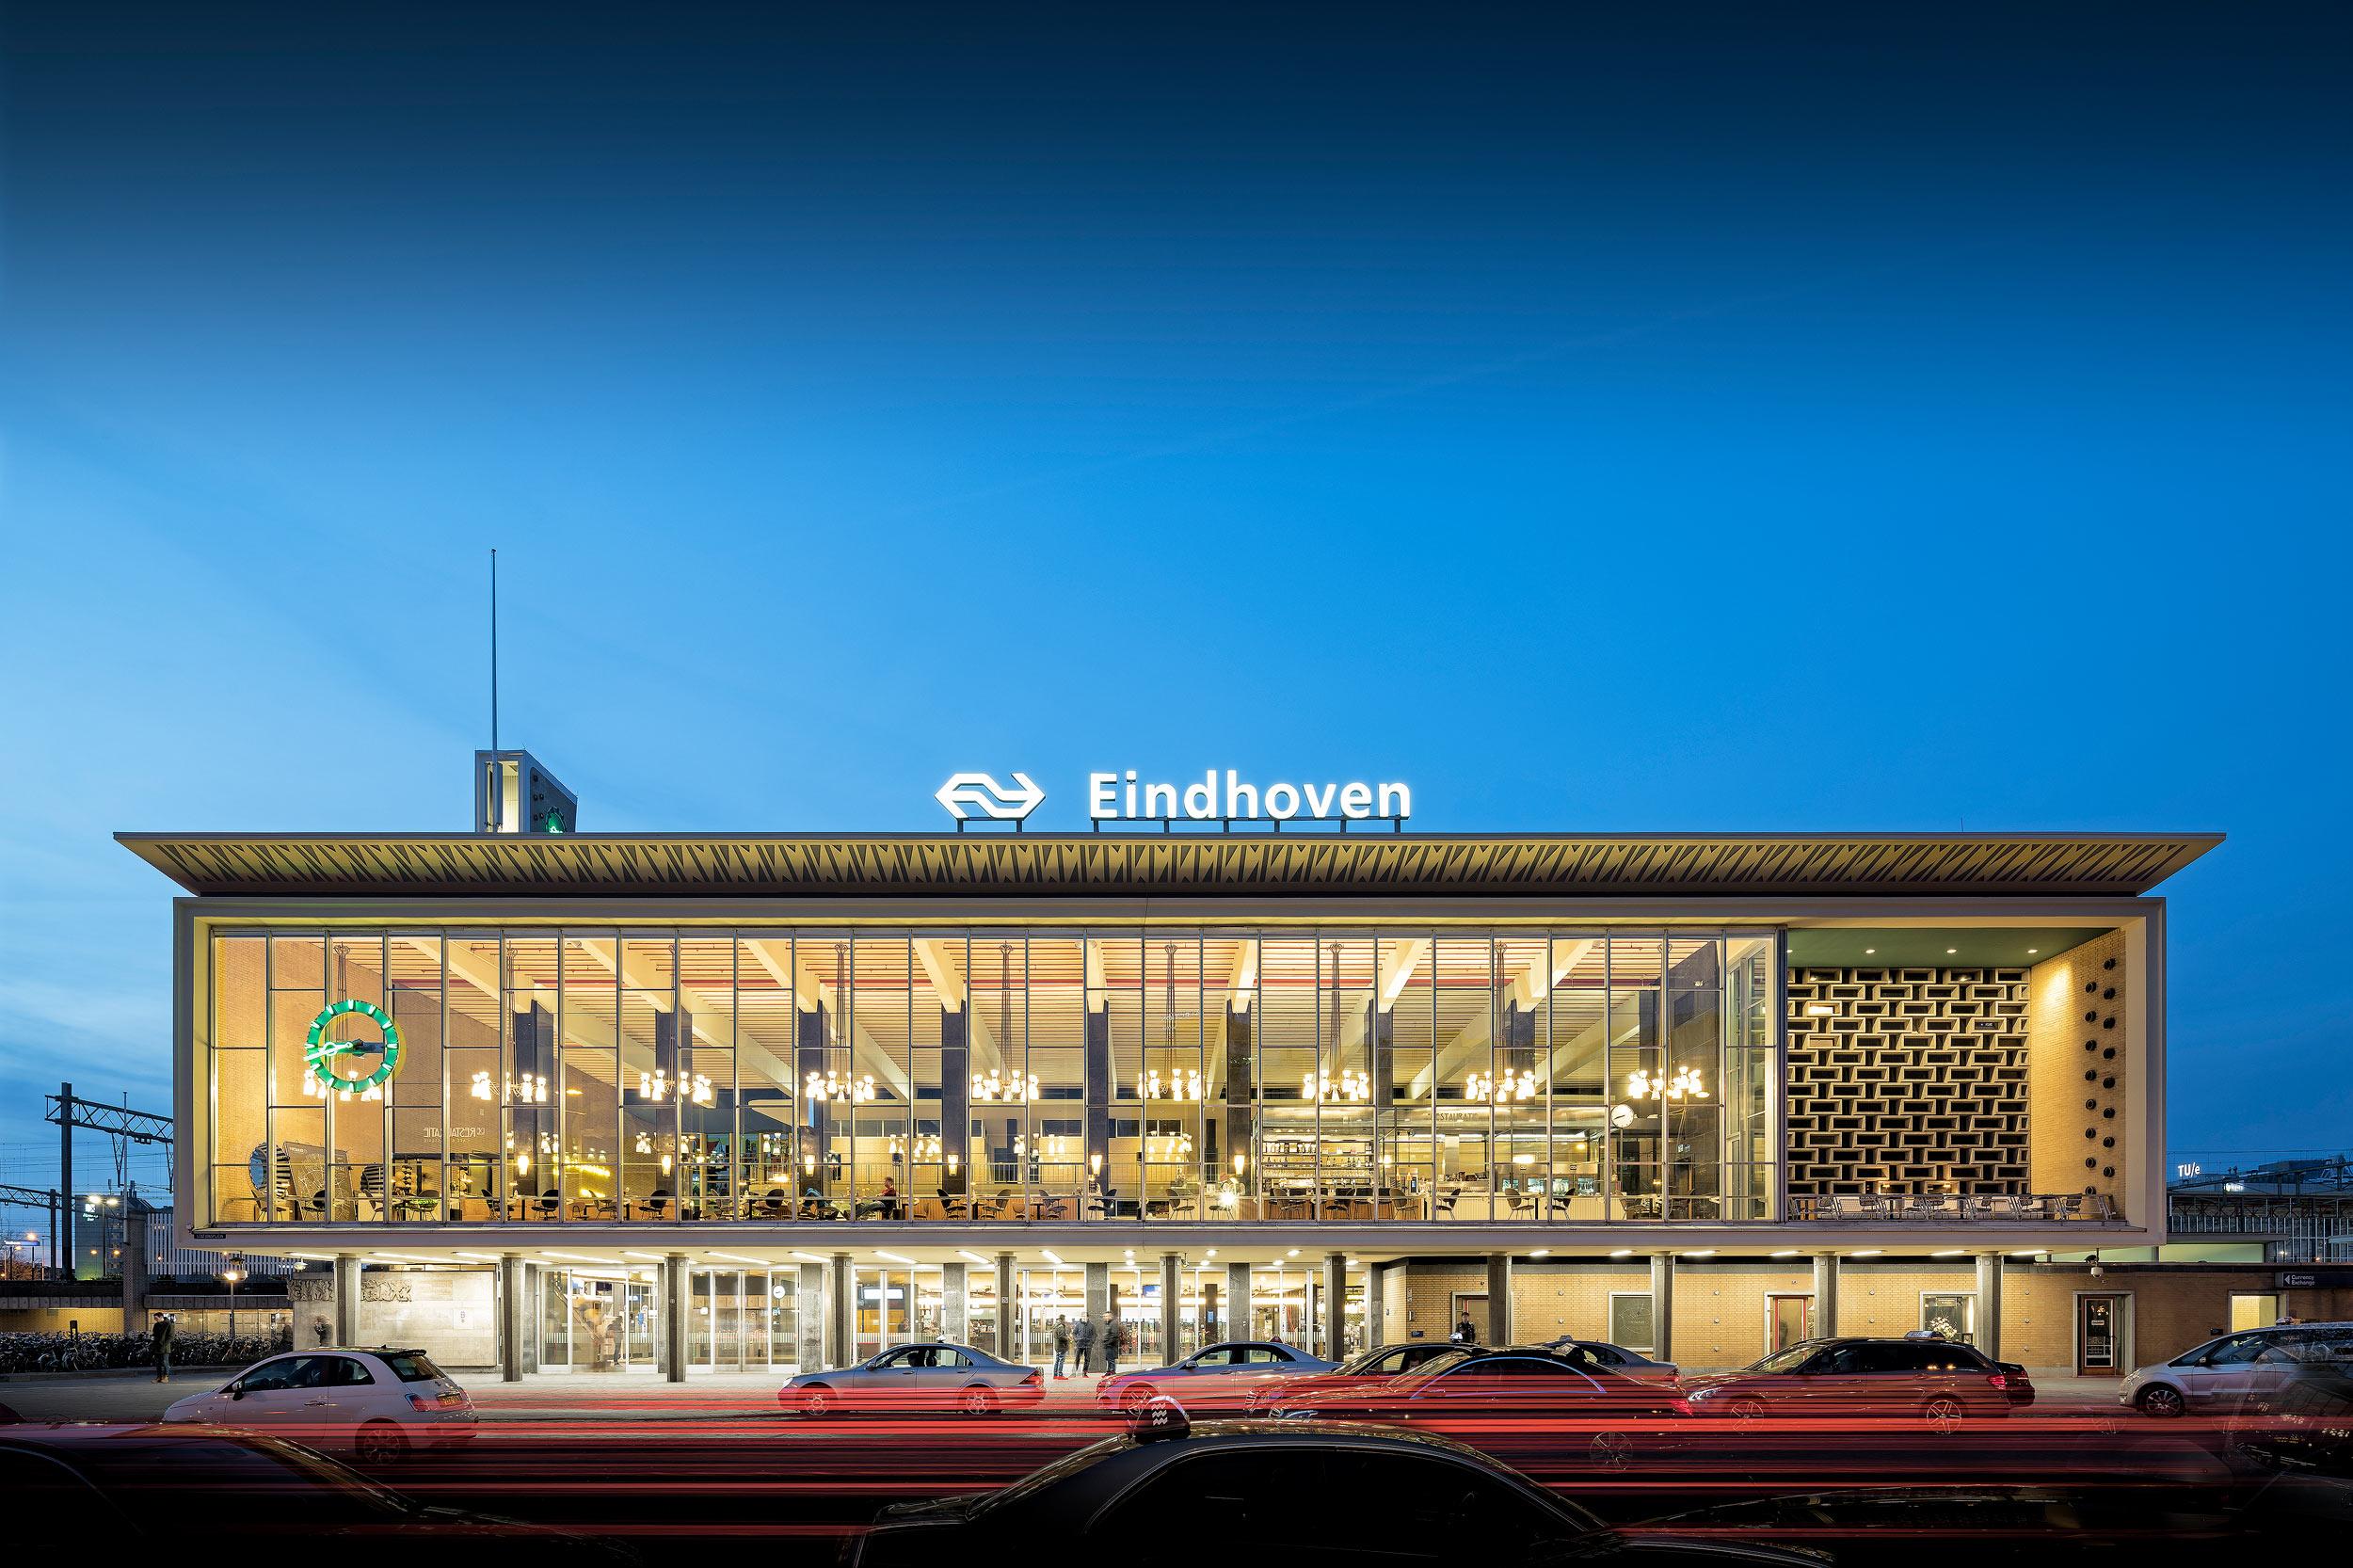 Station Eindhoven - fotografie Chiel de Nooyer, architectuur en interieurfotograaf